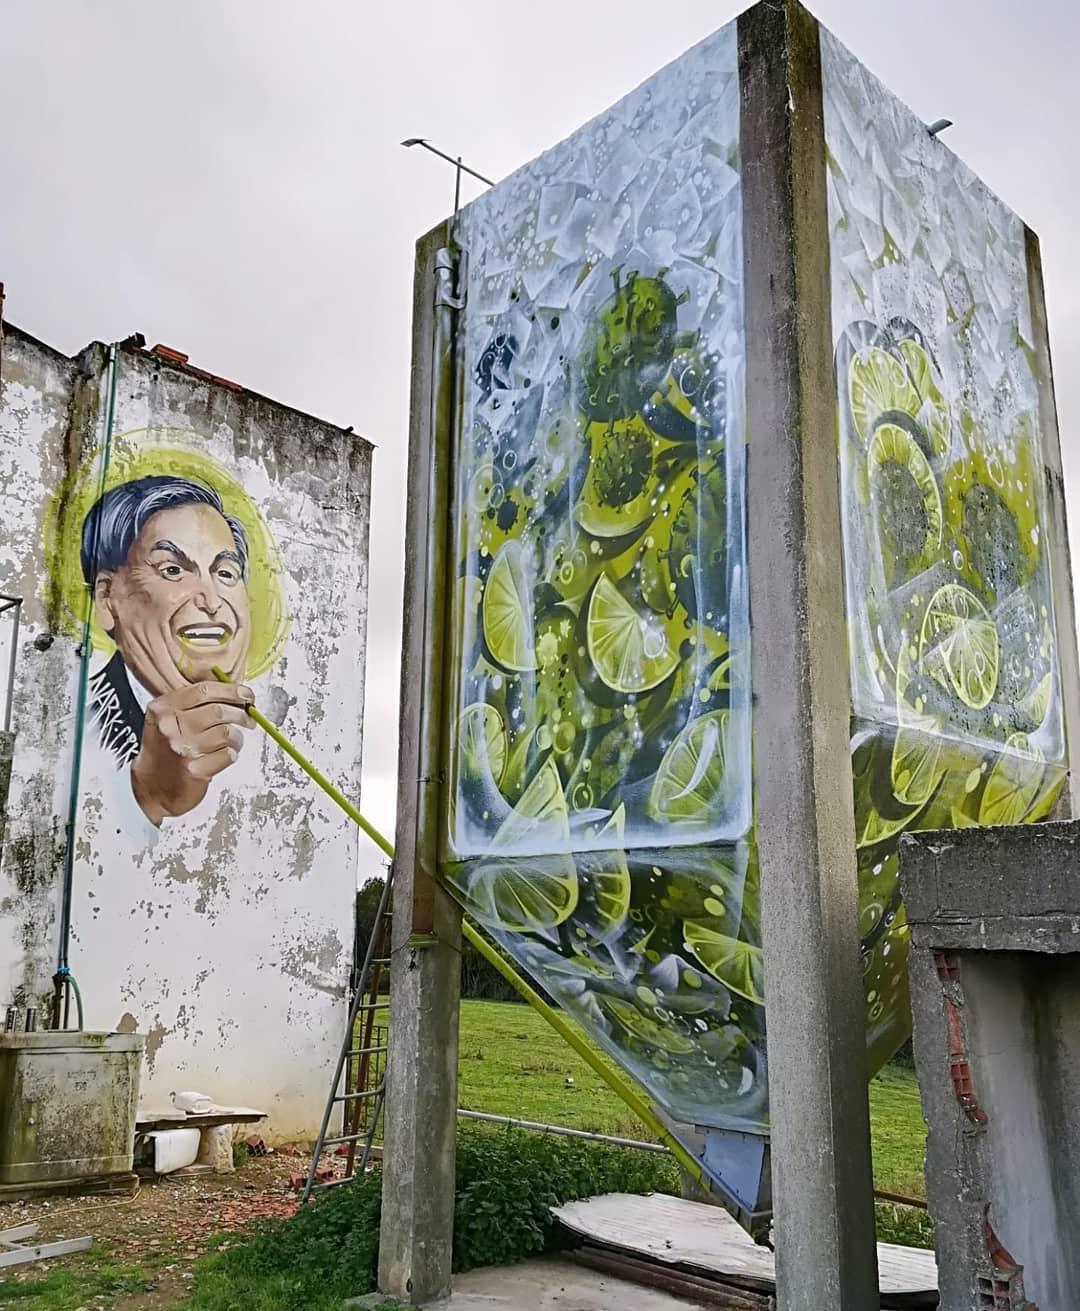 Nark @ Lisbon, Portugal